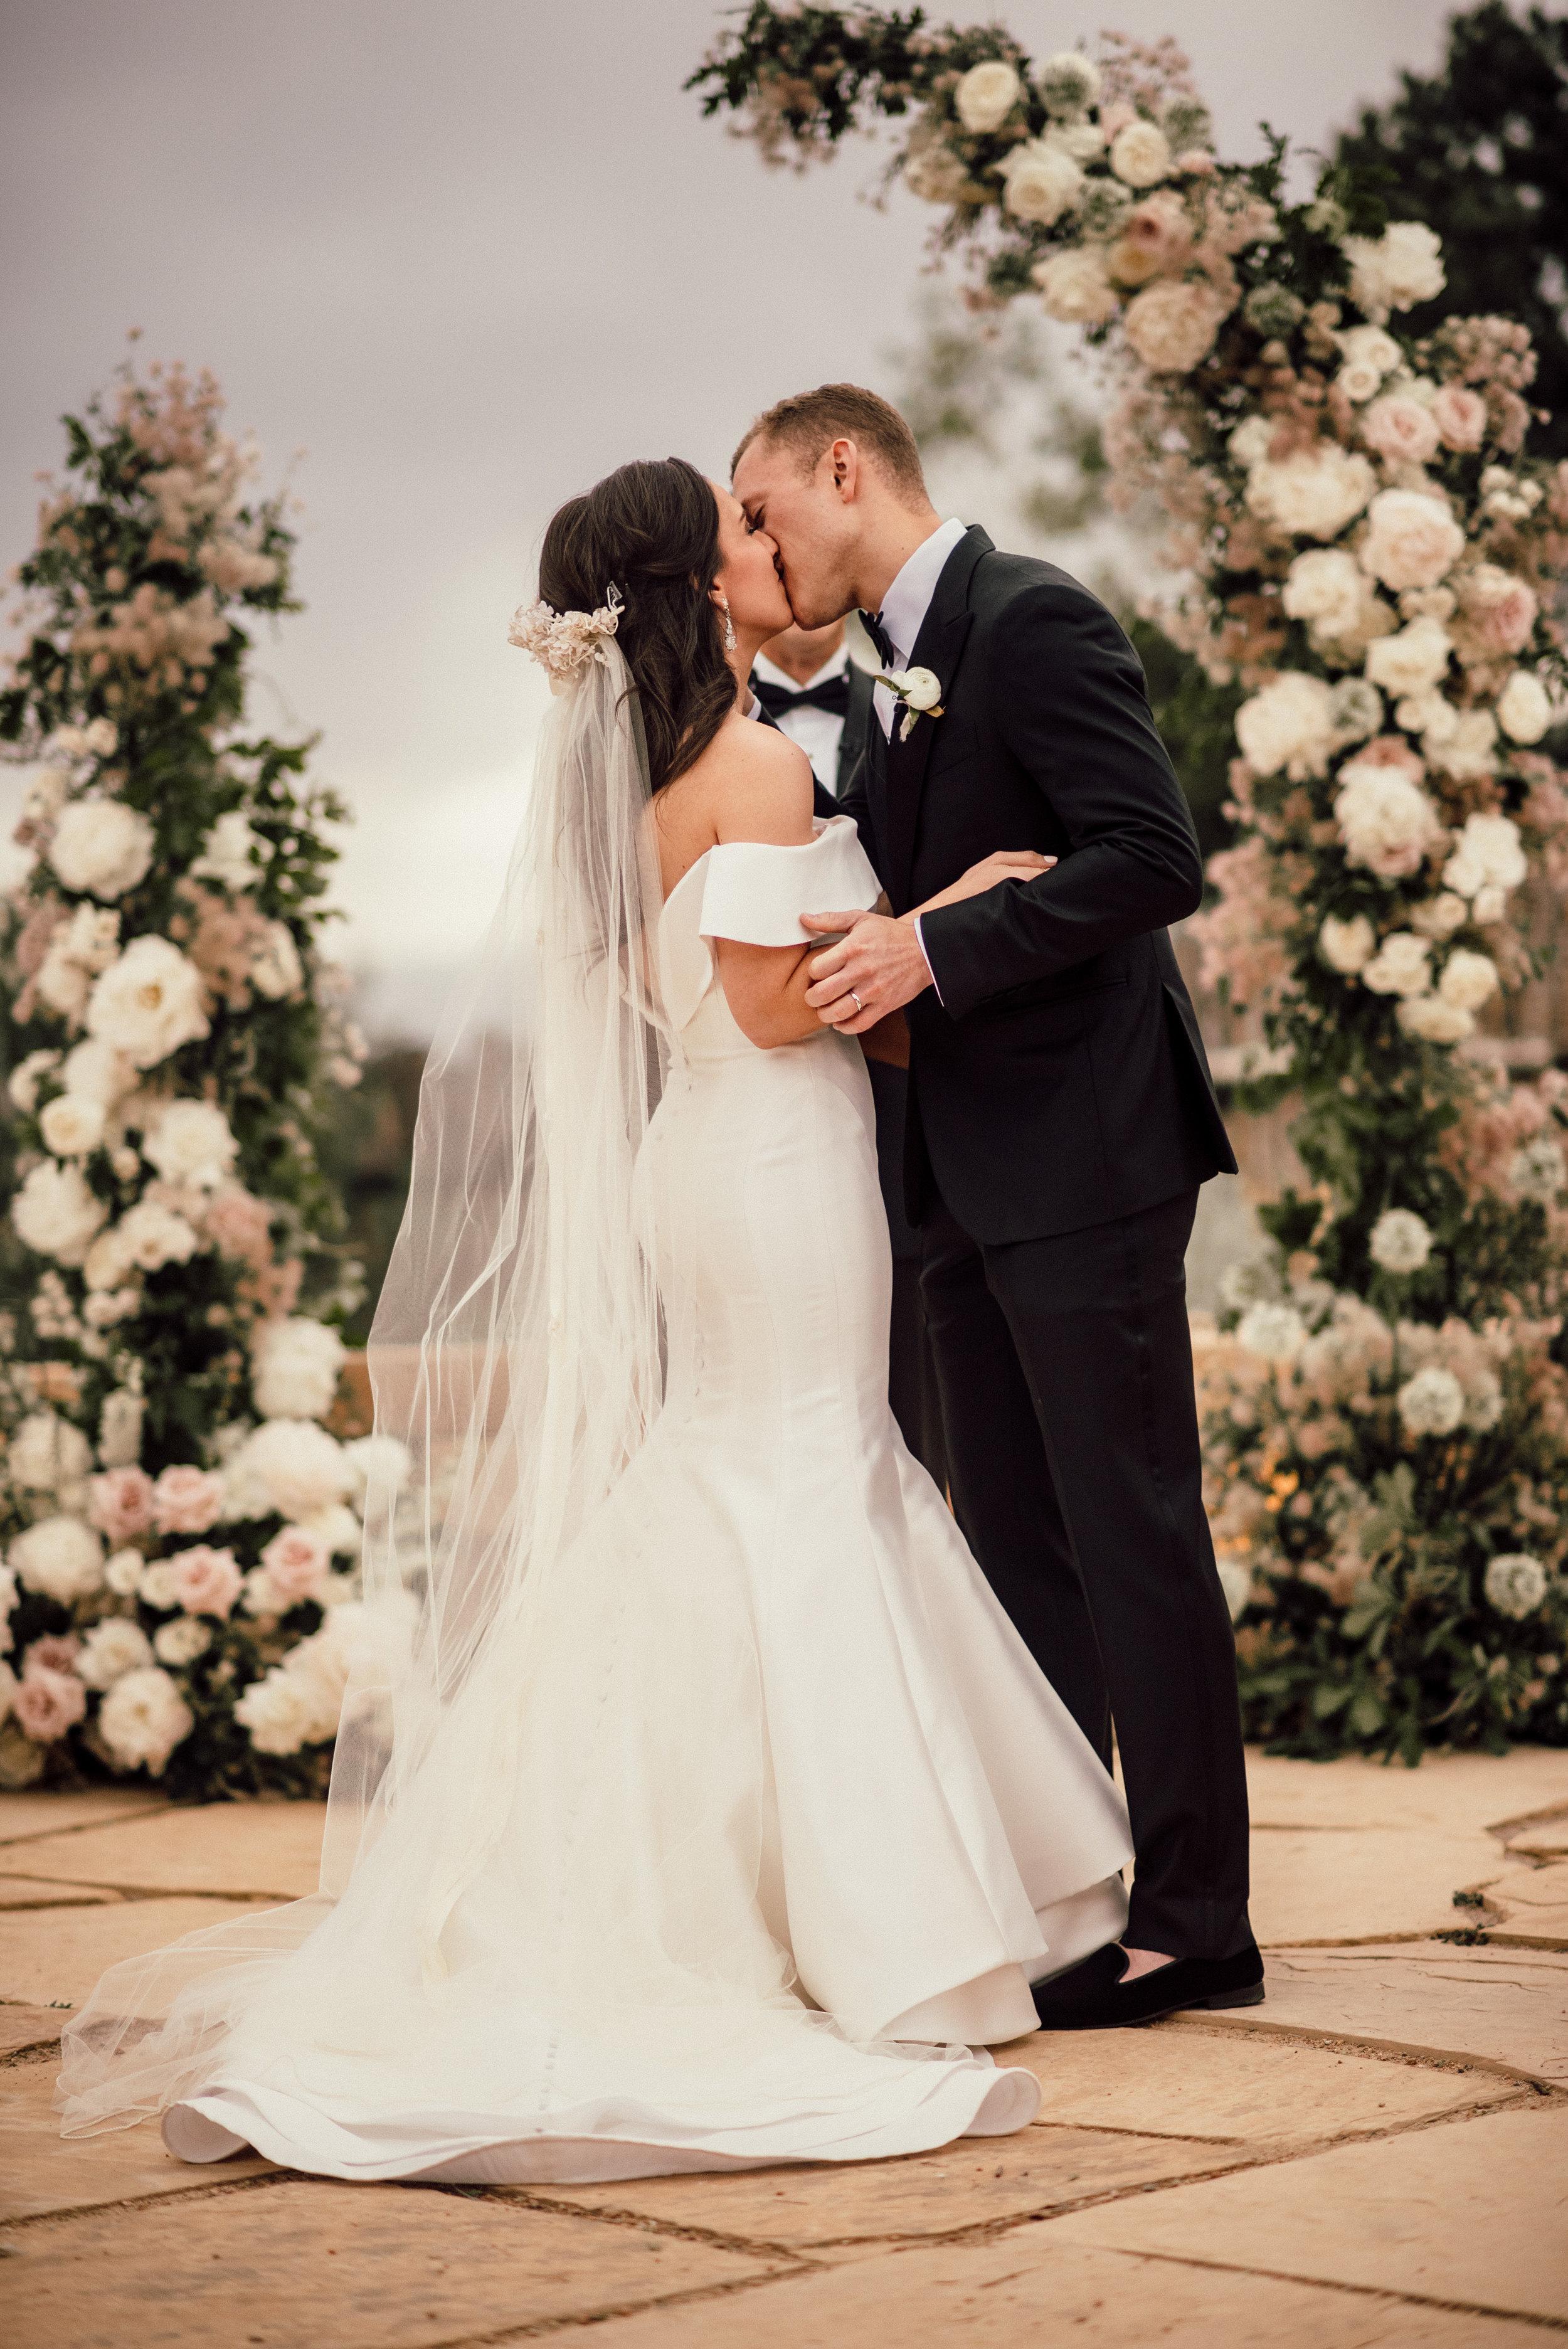 Ceremony Details - Santa Fe, New Mexico - Summer Wedding - Julian Leaver Events